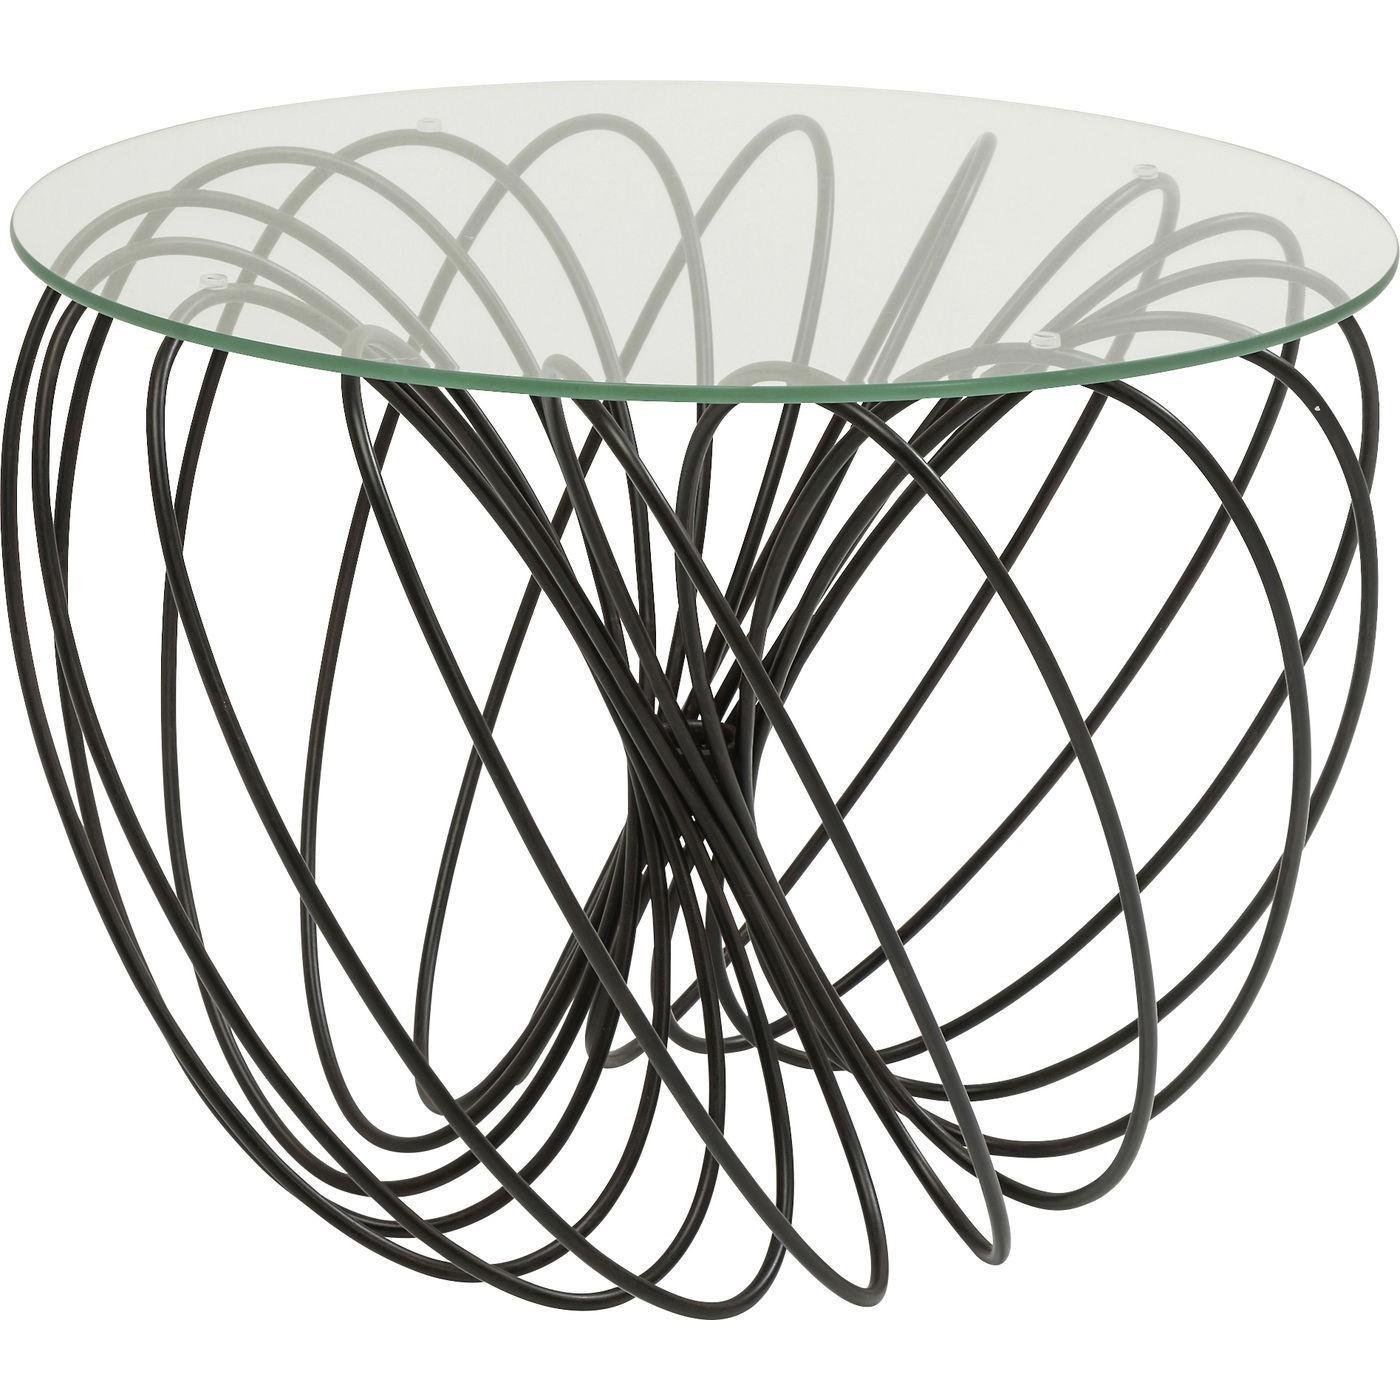 Table basse ronde en verre et acier